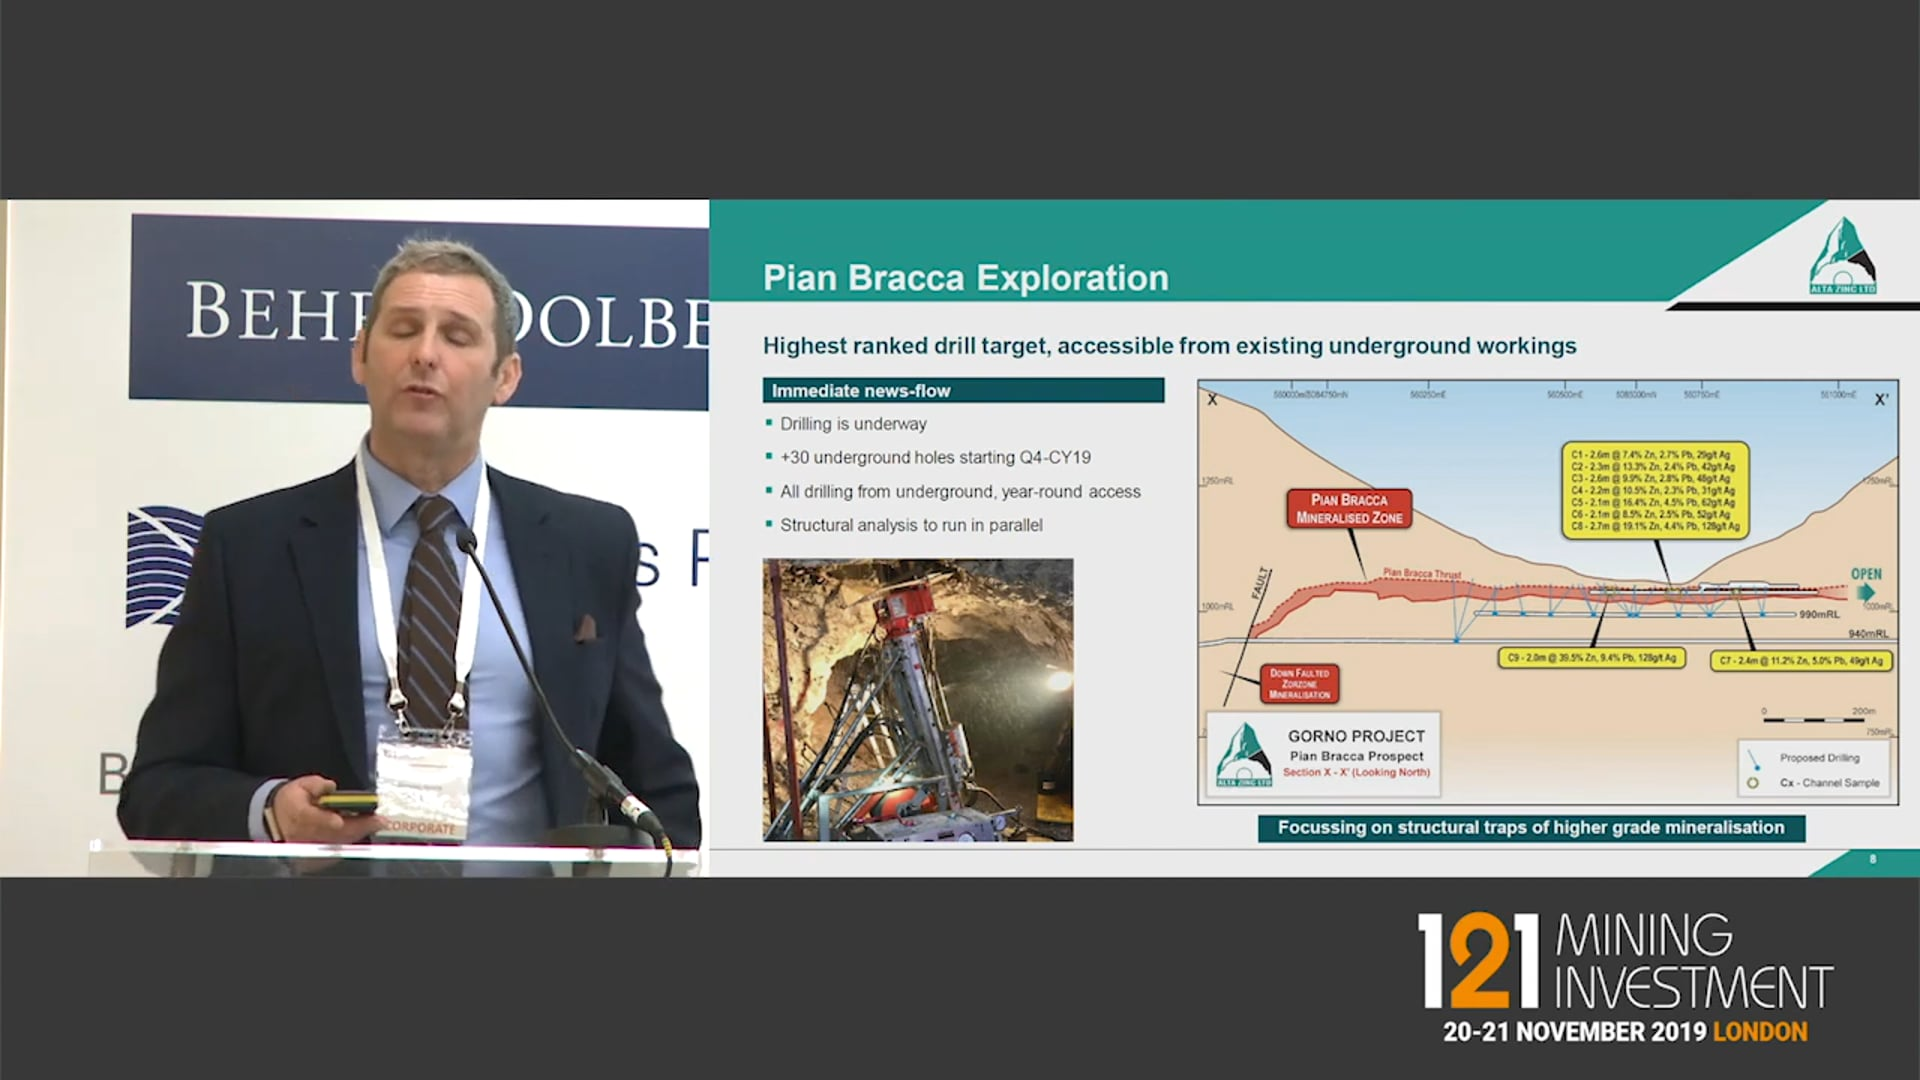 Alta Zinc 121 Mining Investment London Nov 2019